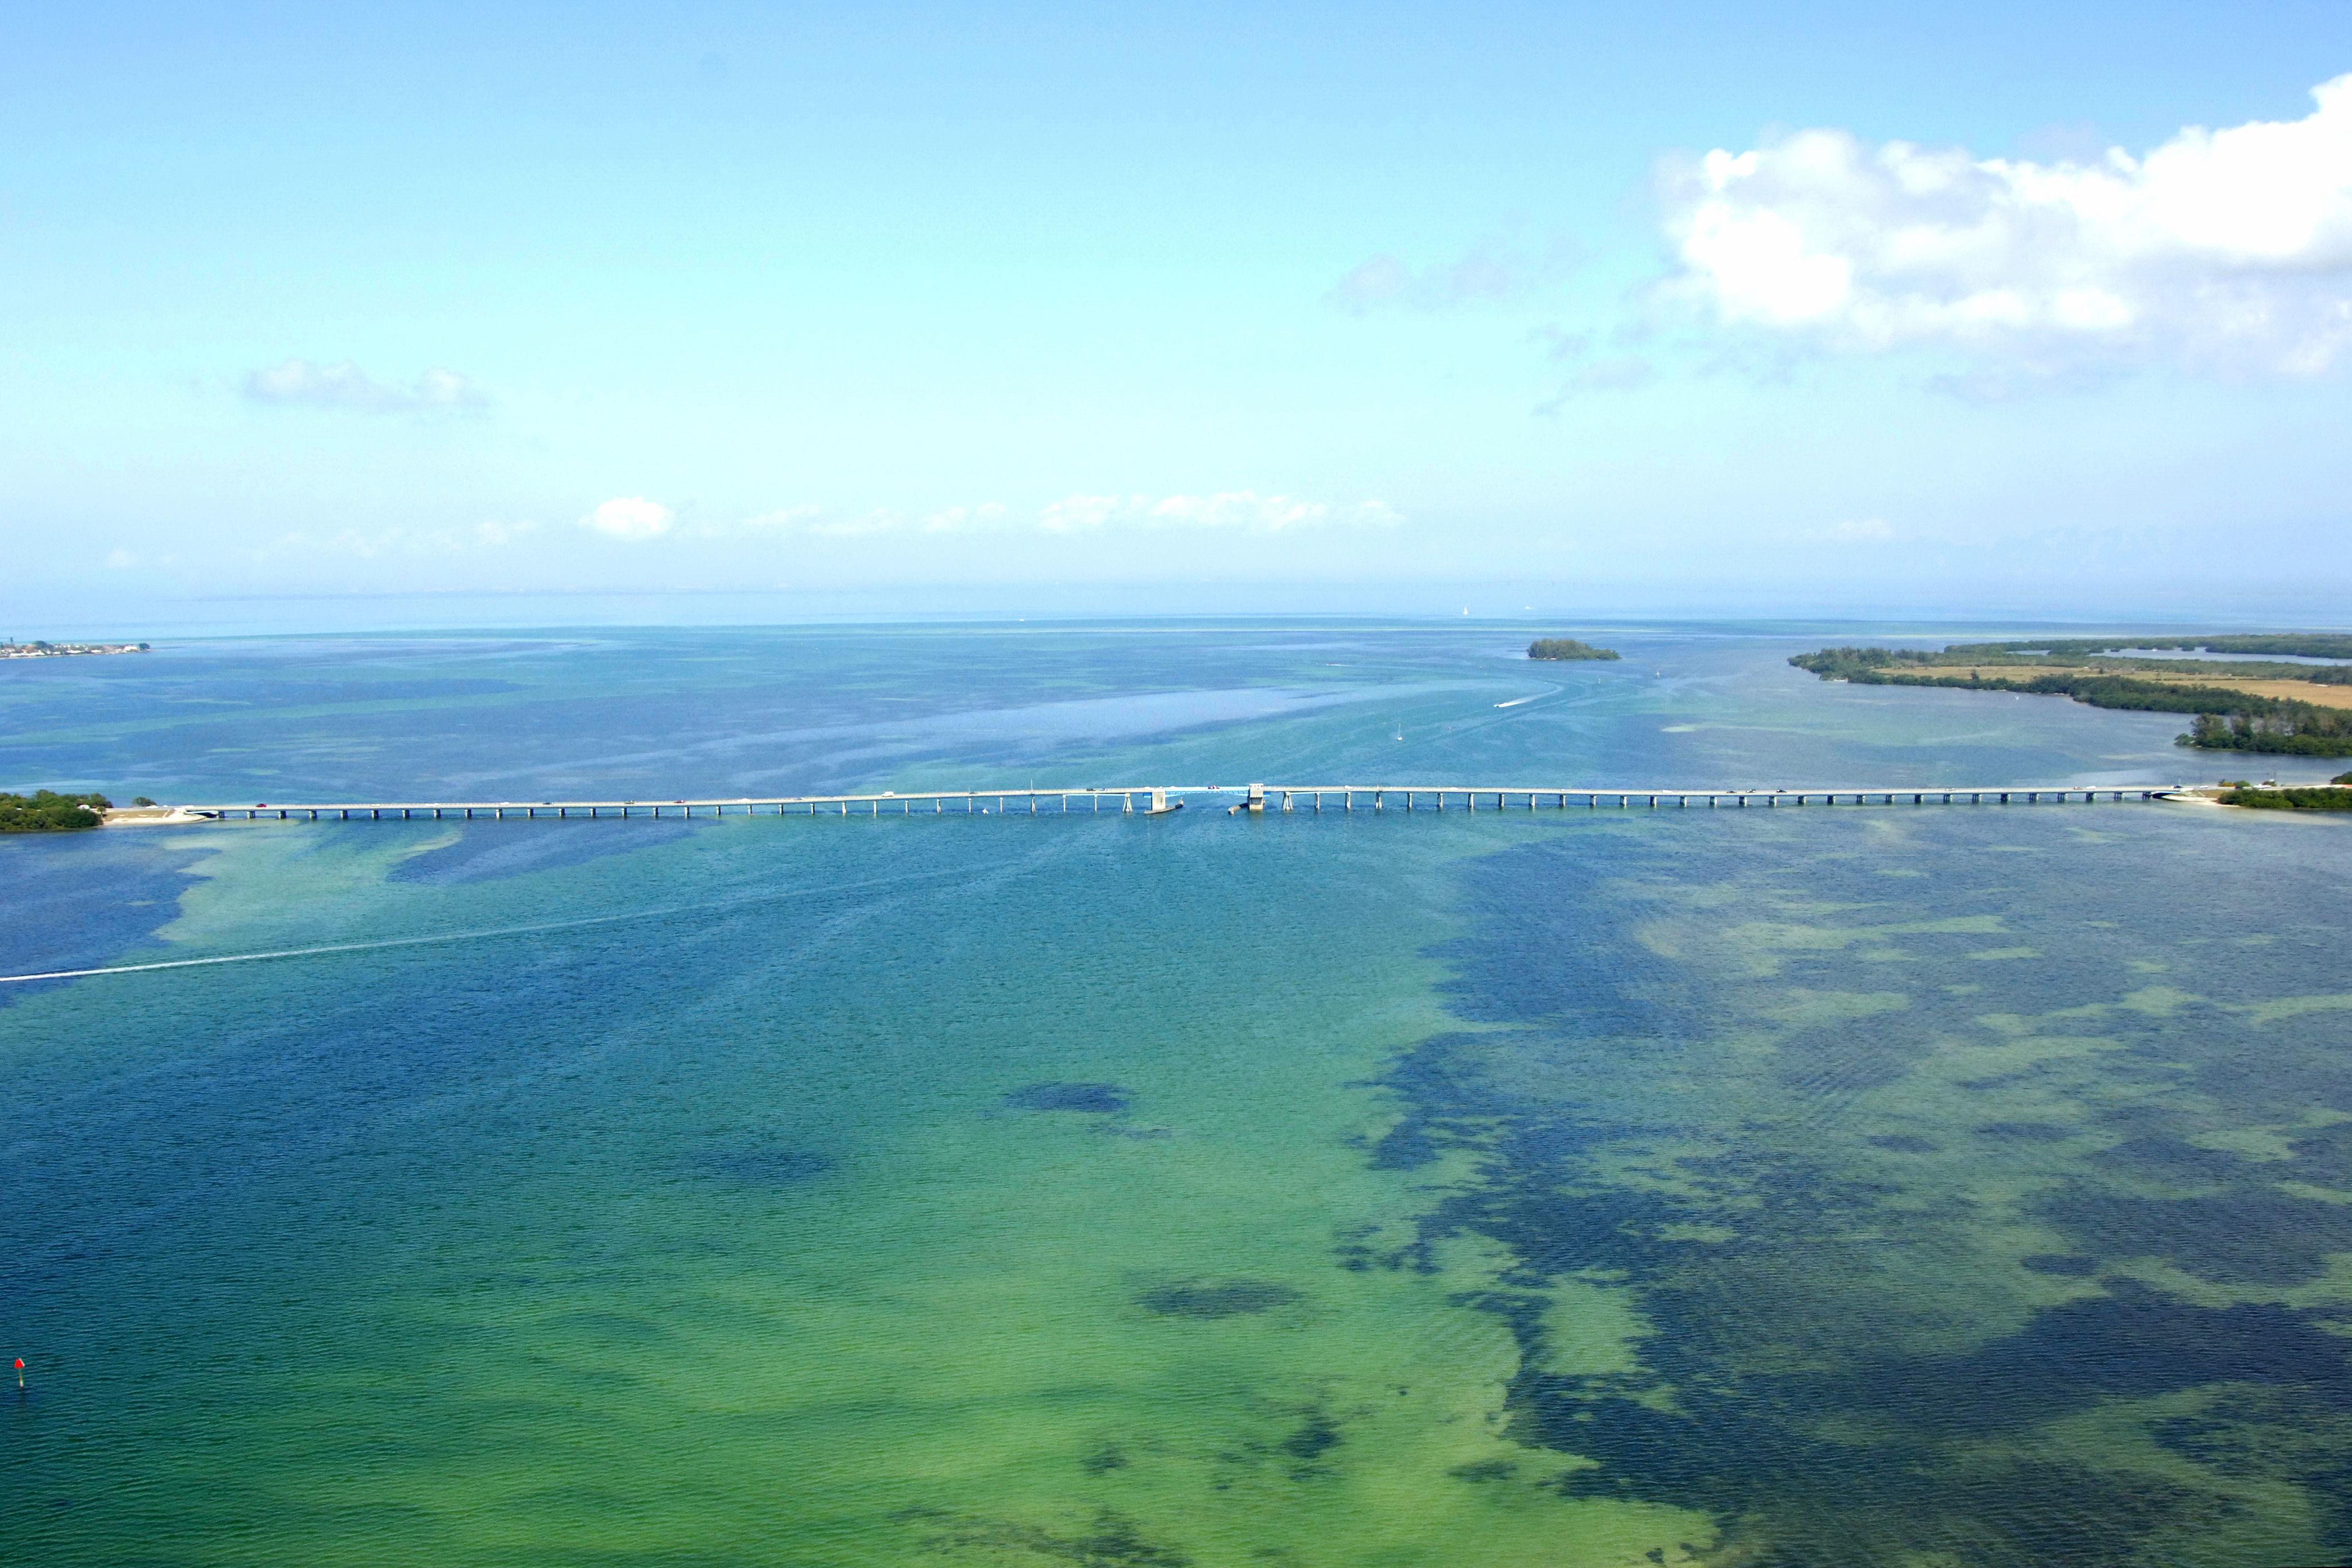 Anna Maria Island Bascule Bridge